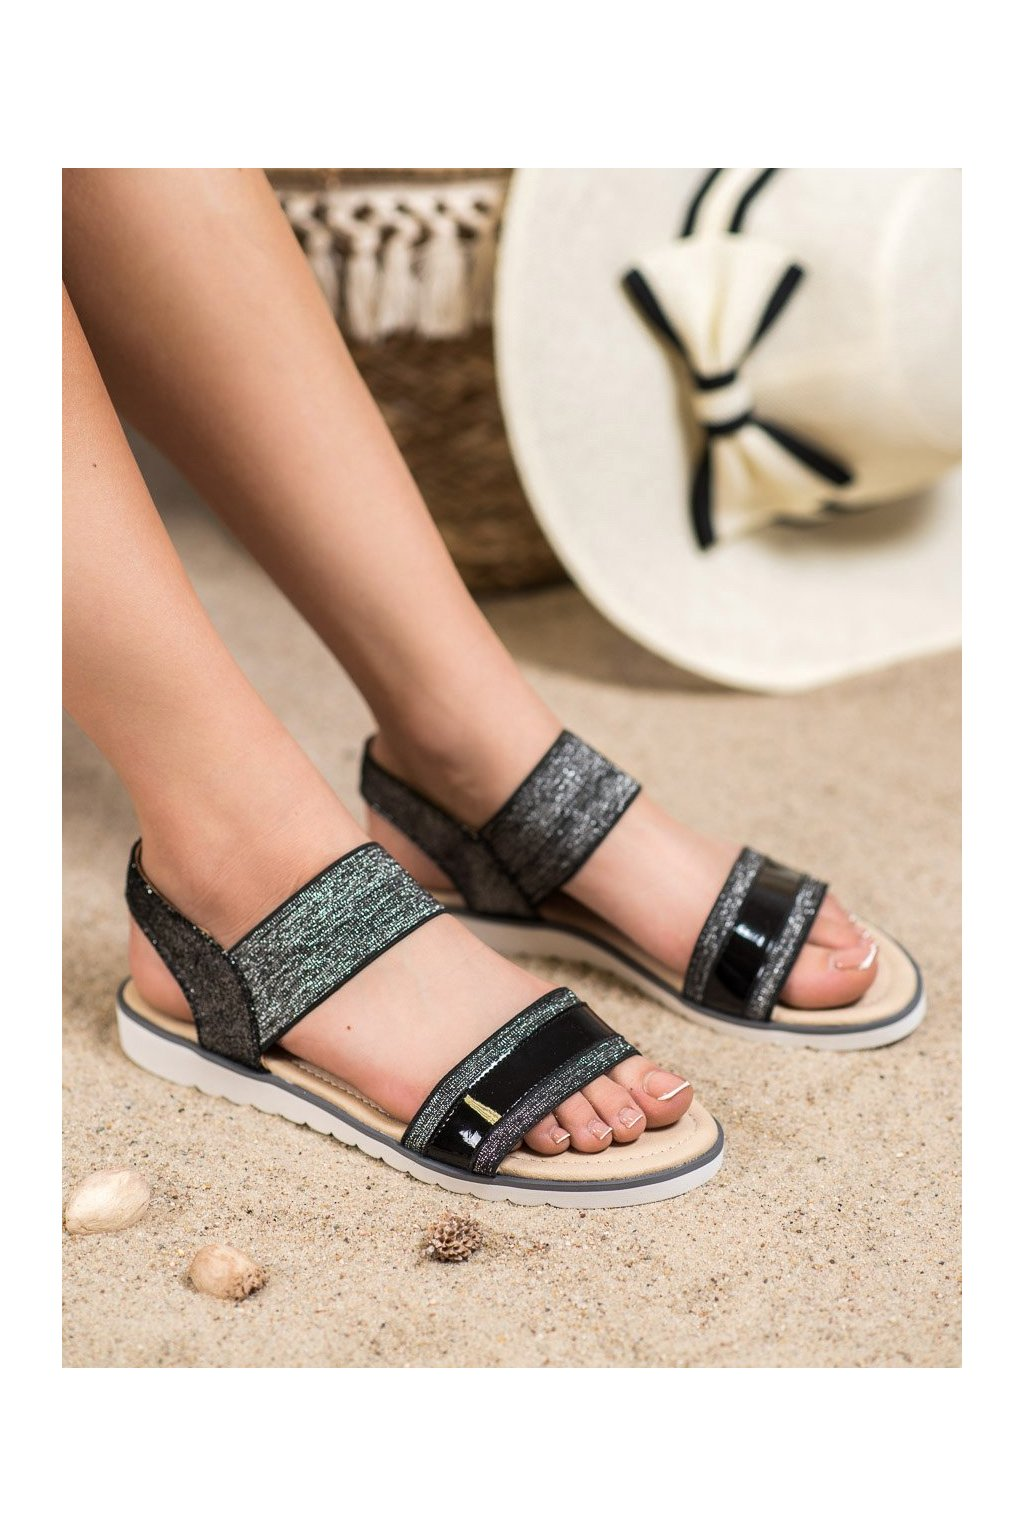 Čierne sandále Filippo kod DS755/19B